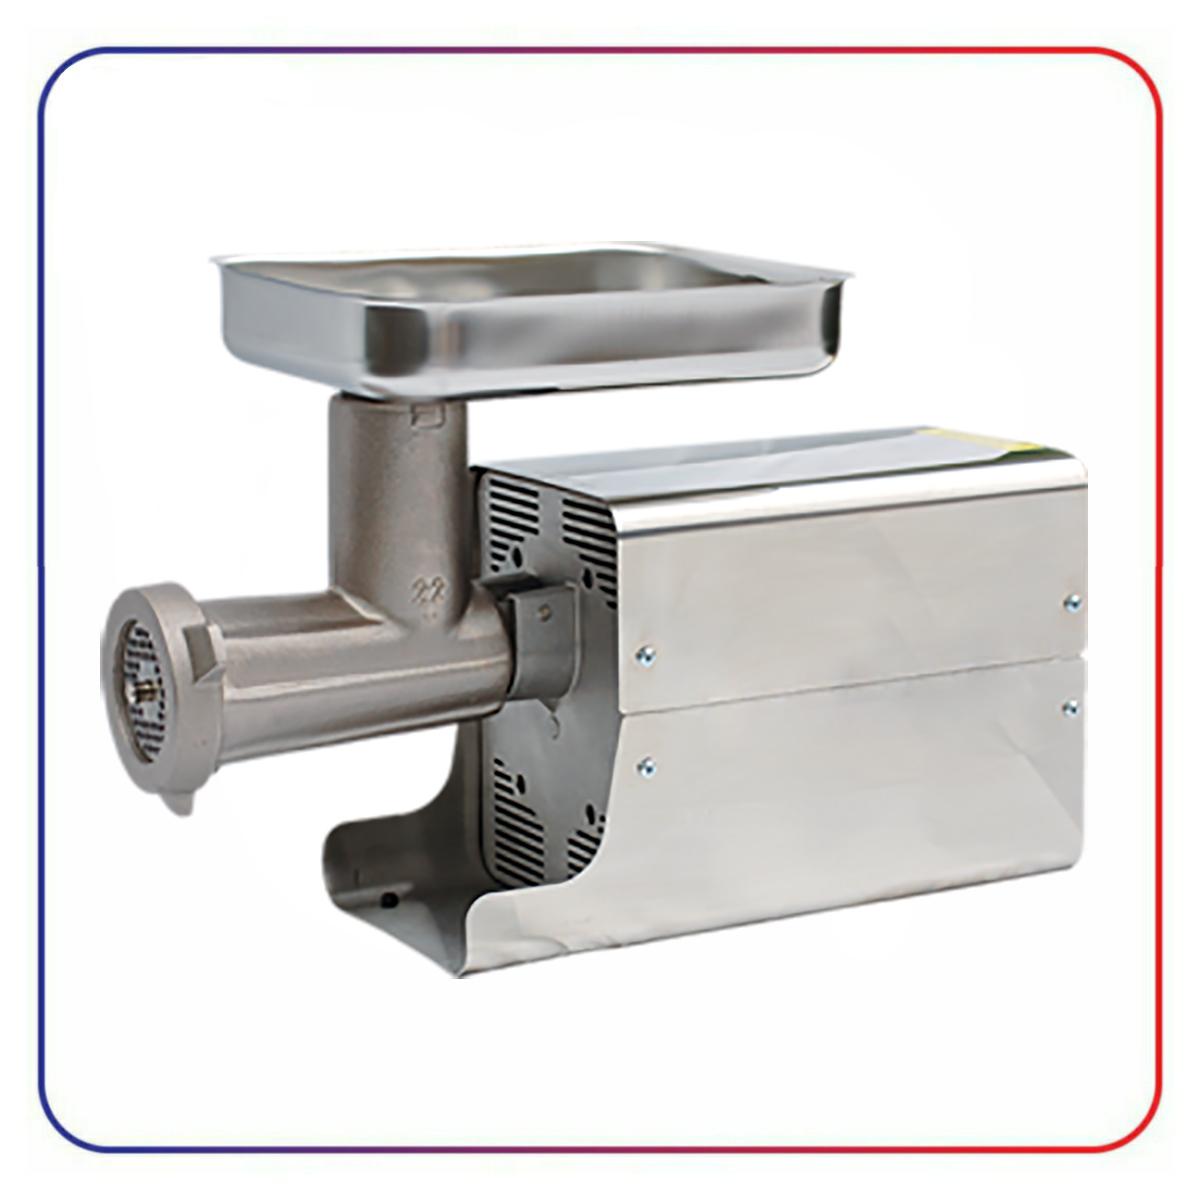 چرخ گوشت نیمه صنعتی چلمی 12 ایتالیا CELME TC 12